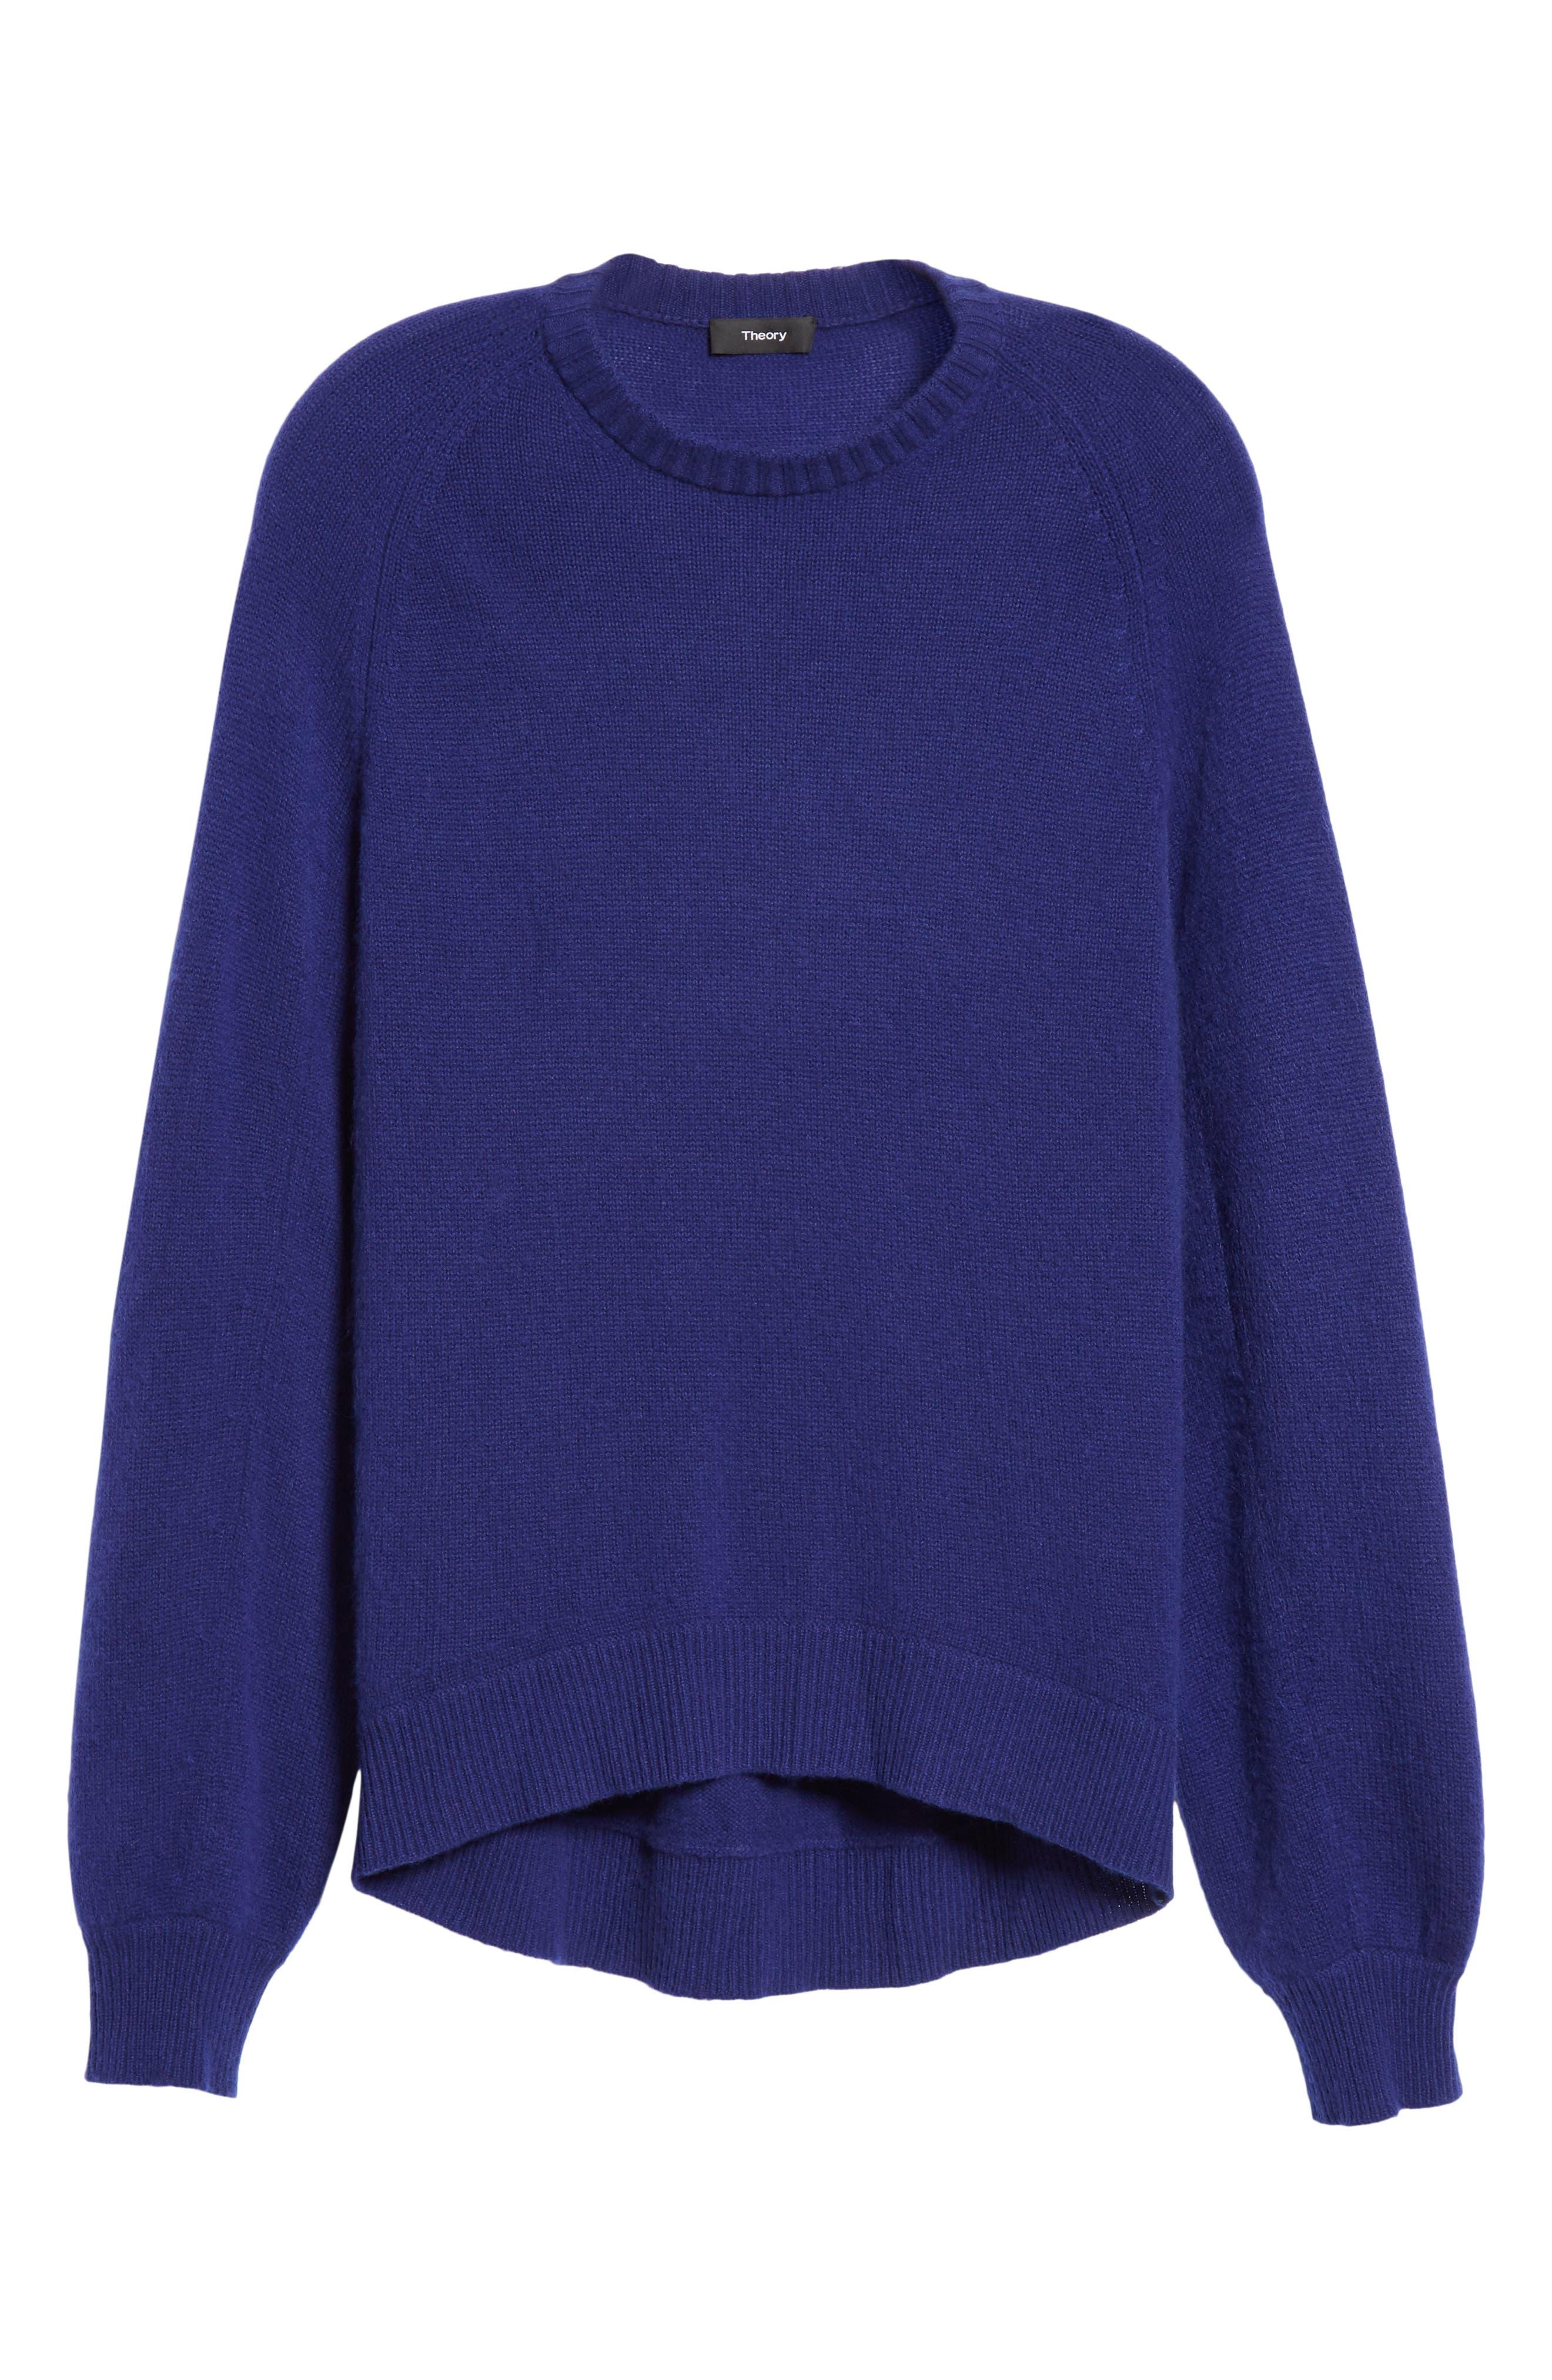 Cashmere Sweater,                             Alternate thumbnail 6, color,                             PERSIAN BLUE